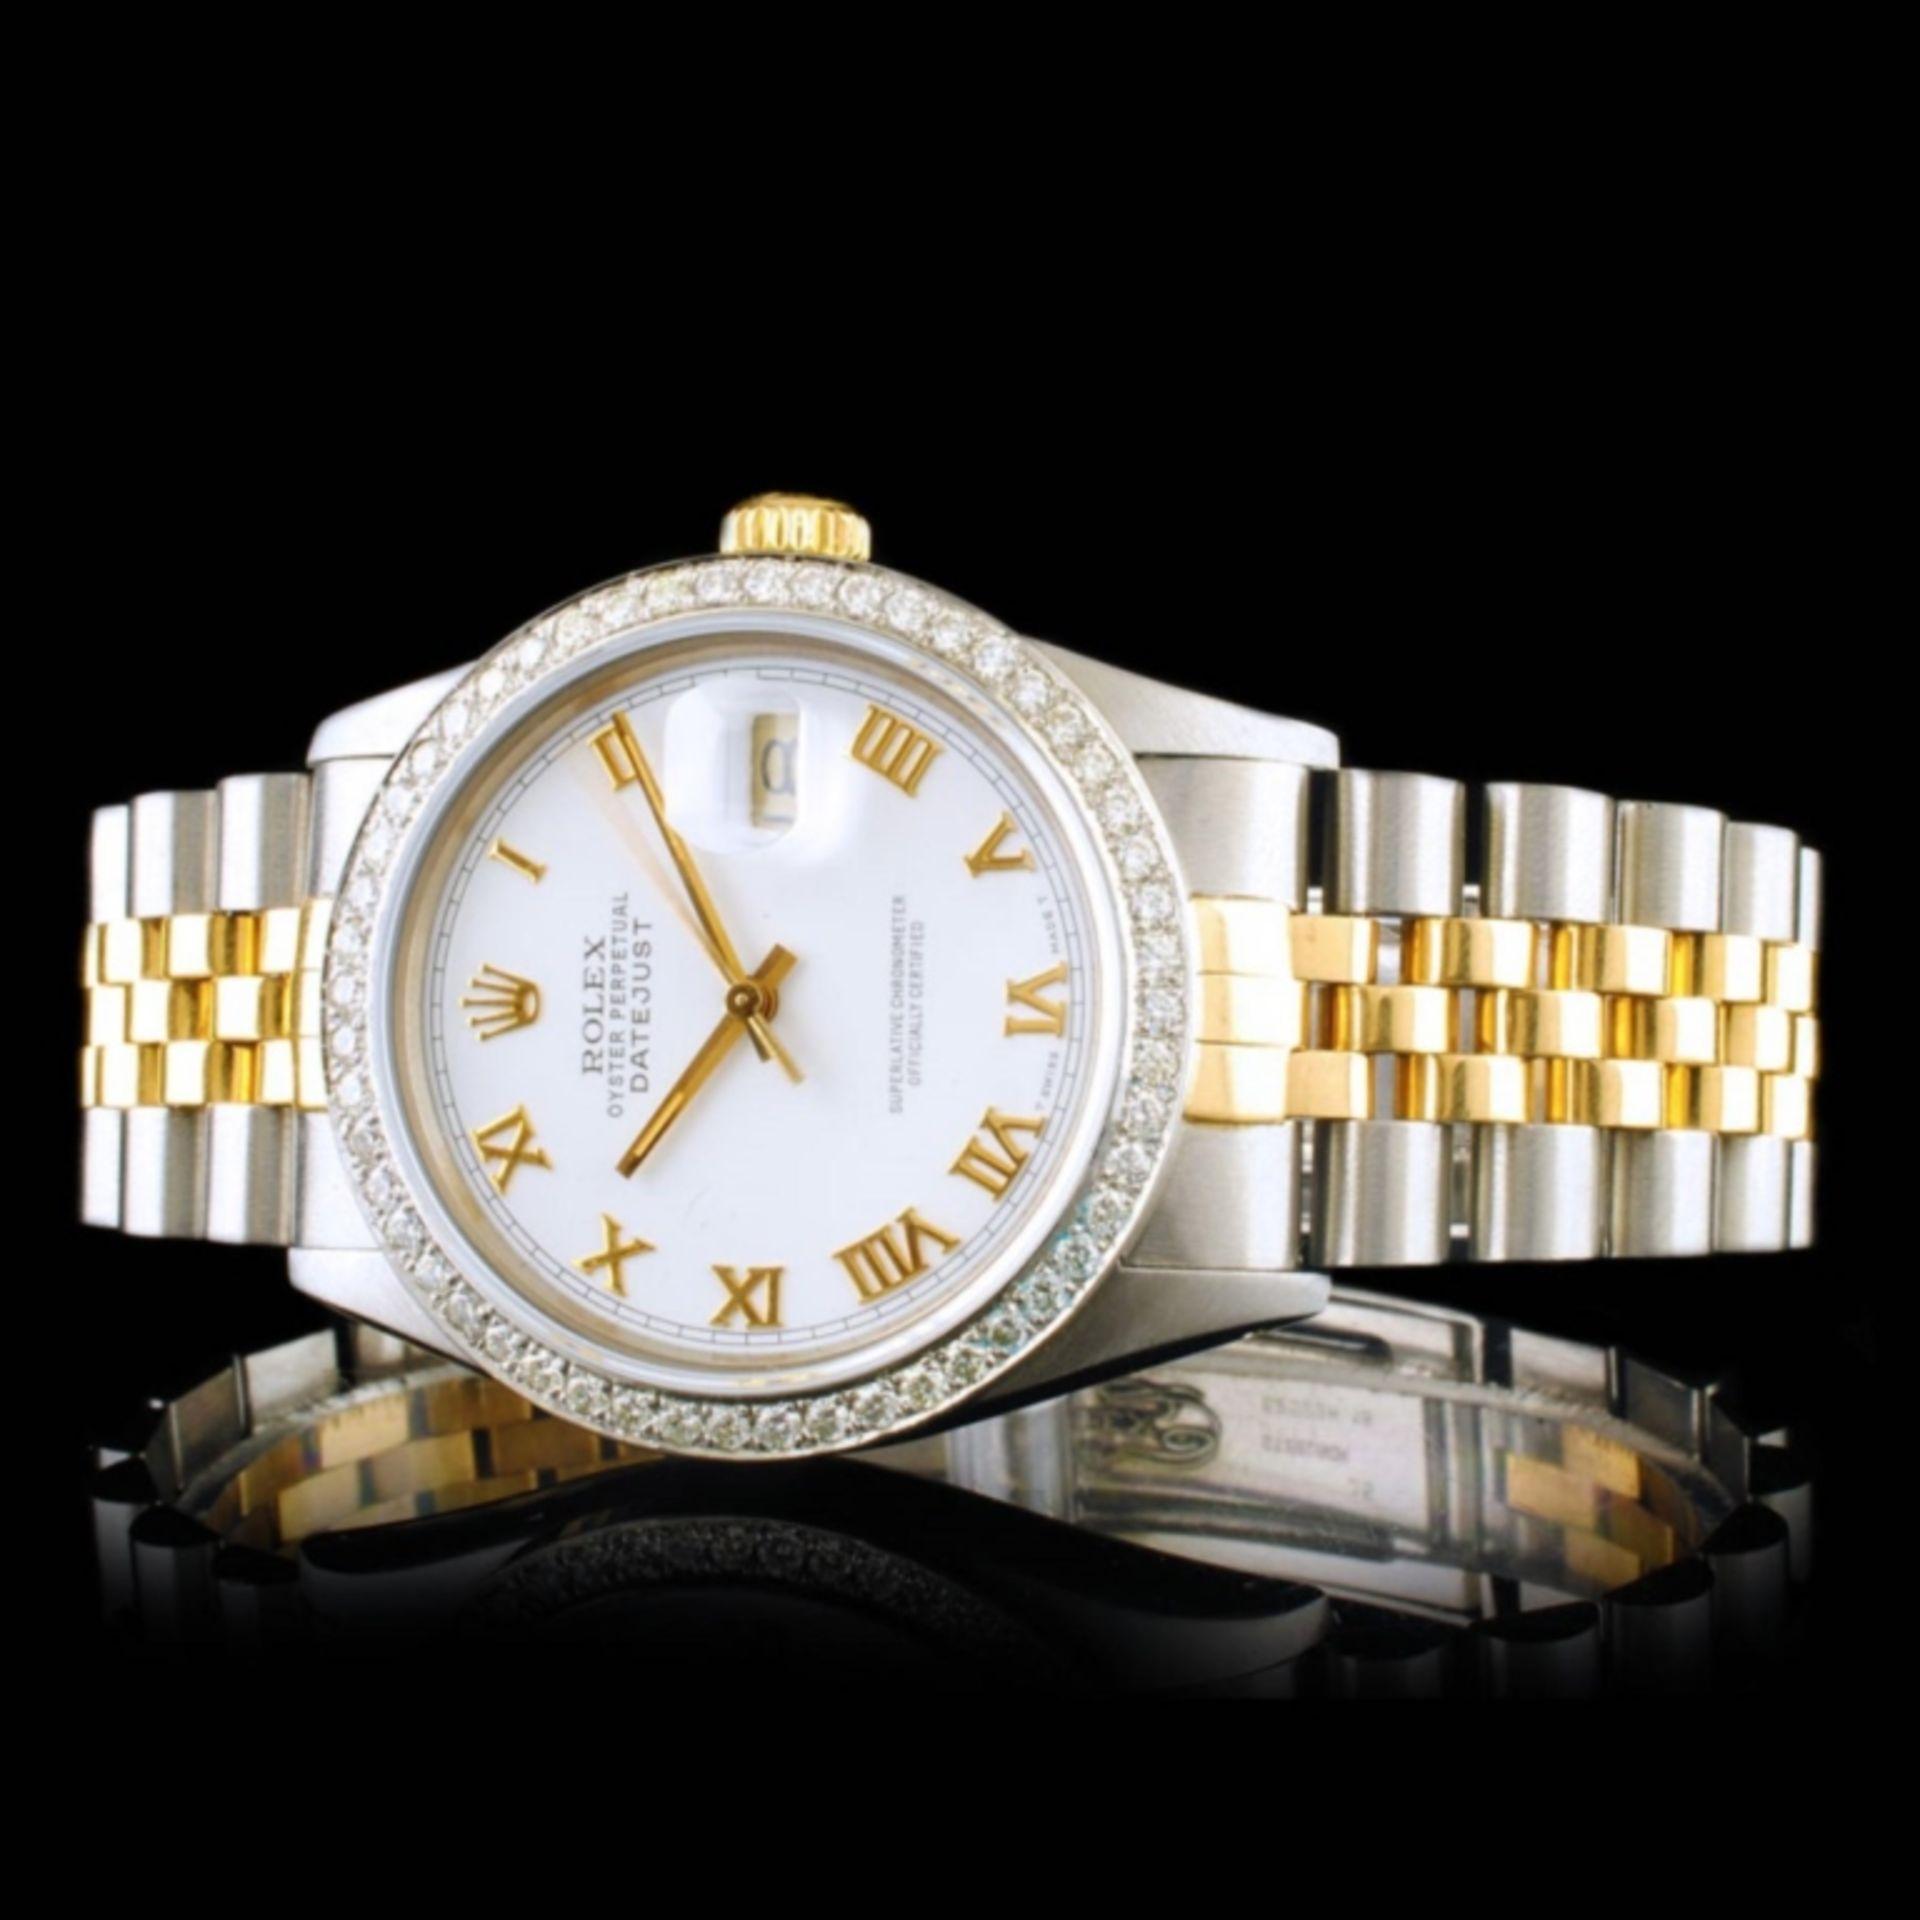 Rolex DateJust YG/SS Diamond 36mm Wristwatch - Image 3 of 6